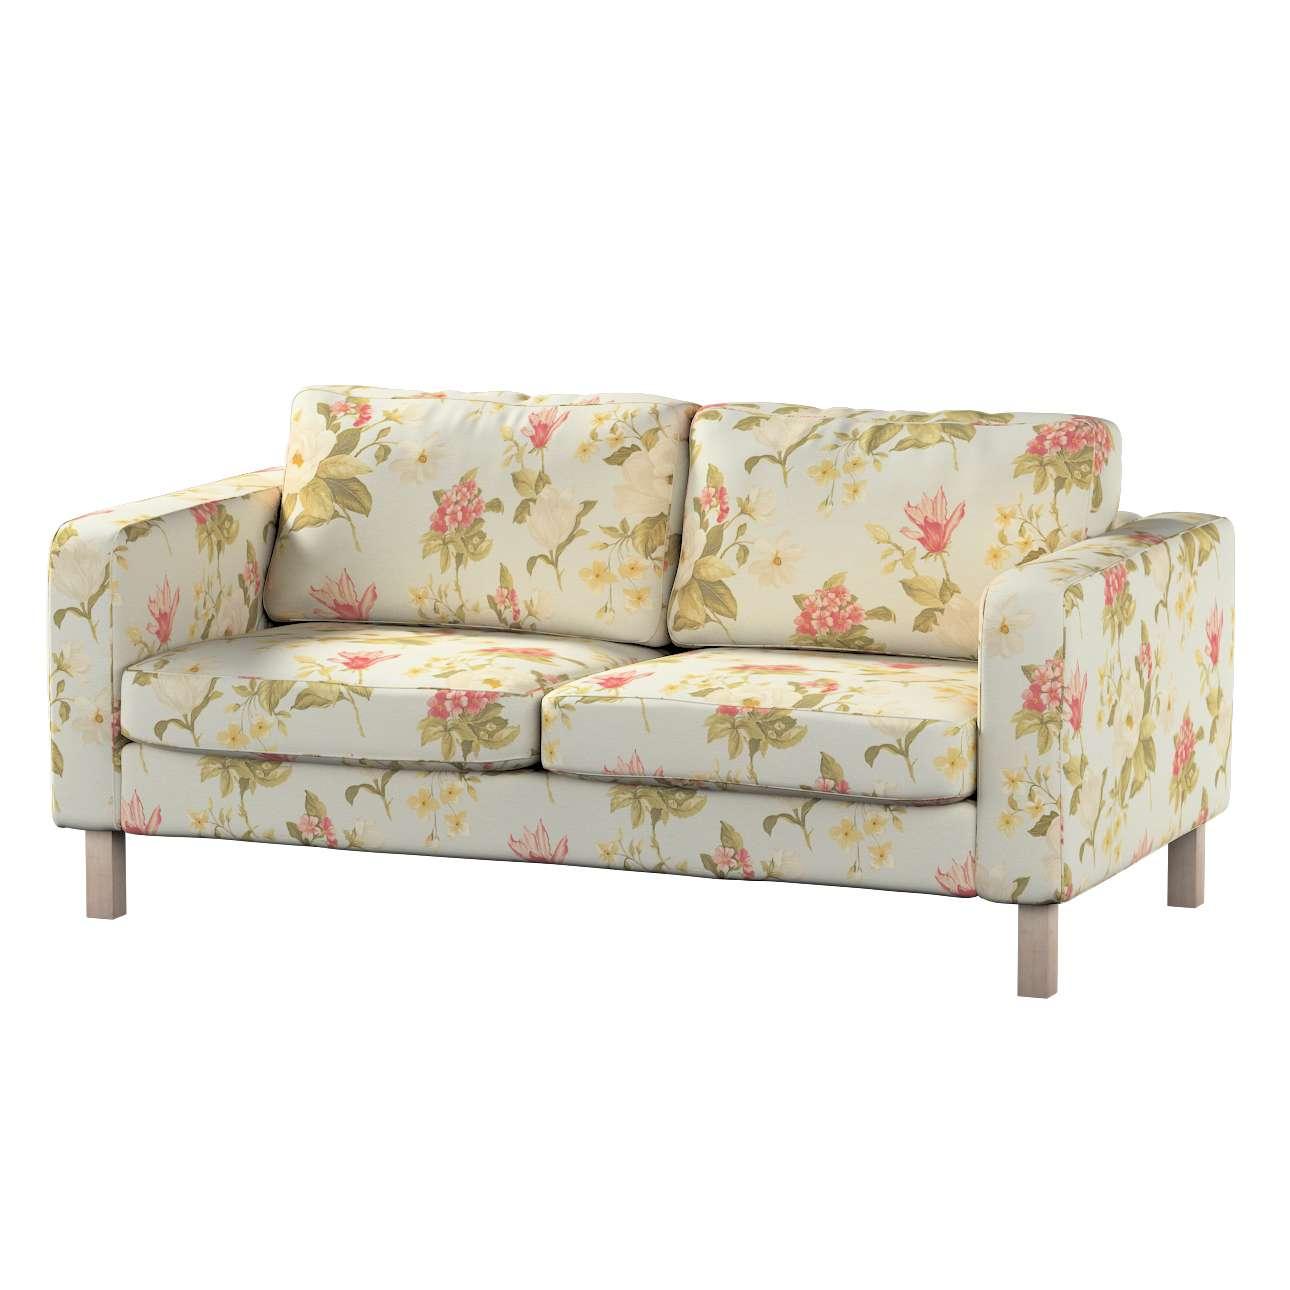 KARSLTAD dvivietės sofos užvalkalas Karlstad 2-vietės sofos užvalkalas kolekcijoje Londres, audinys: 123-65